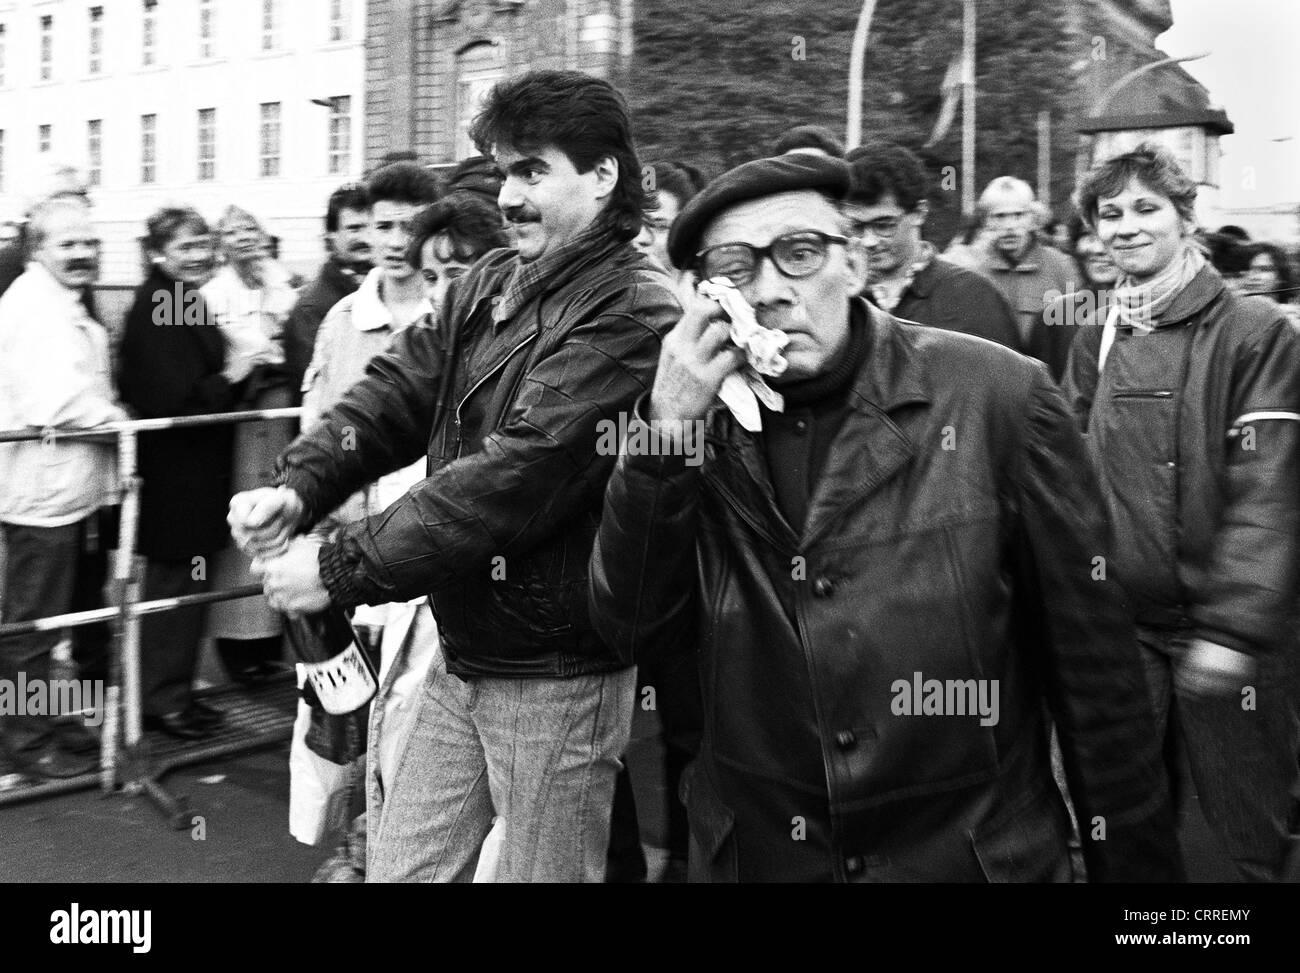 Fall der Mauer 1989, Invalidenstraße, Berlin Stockbild